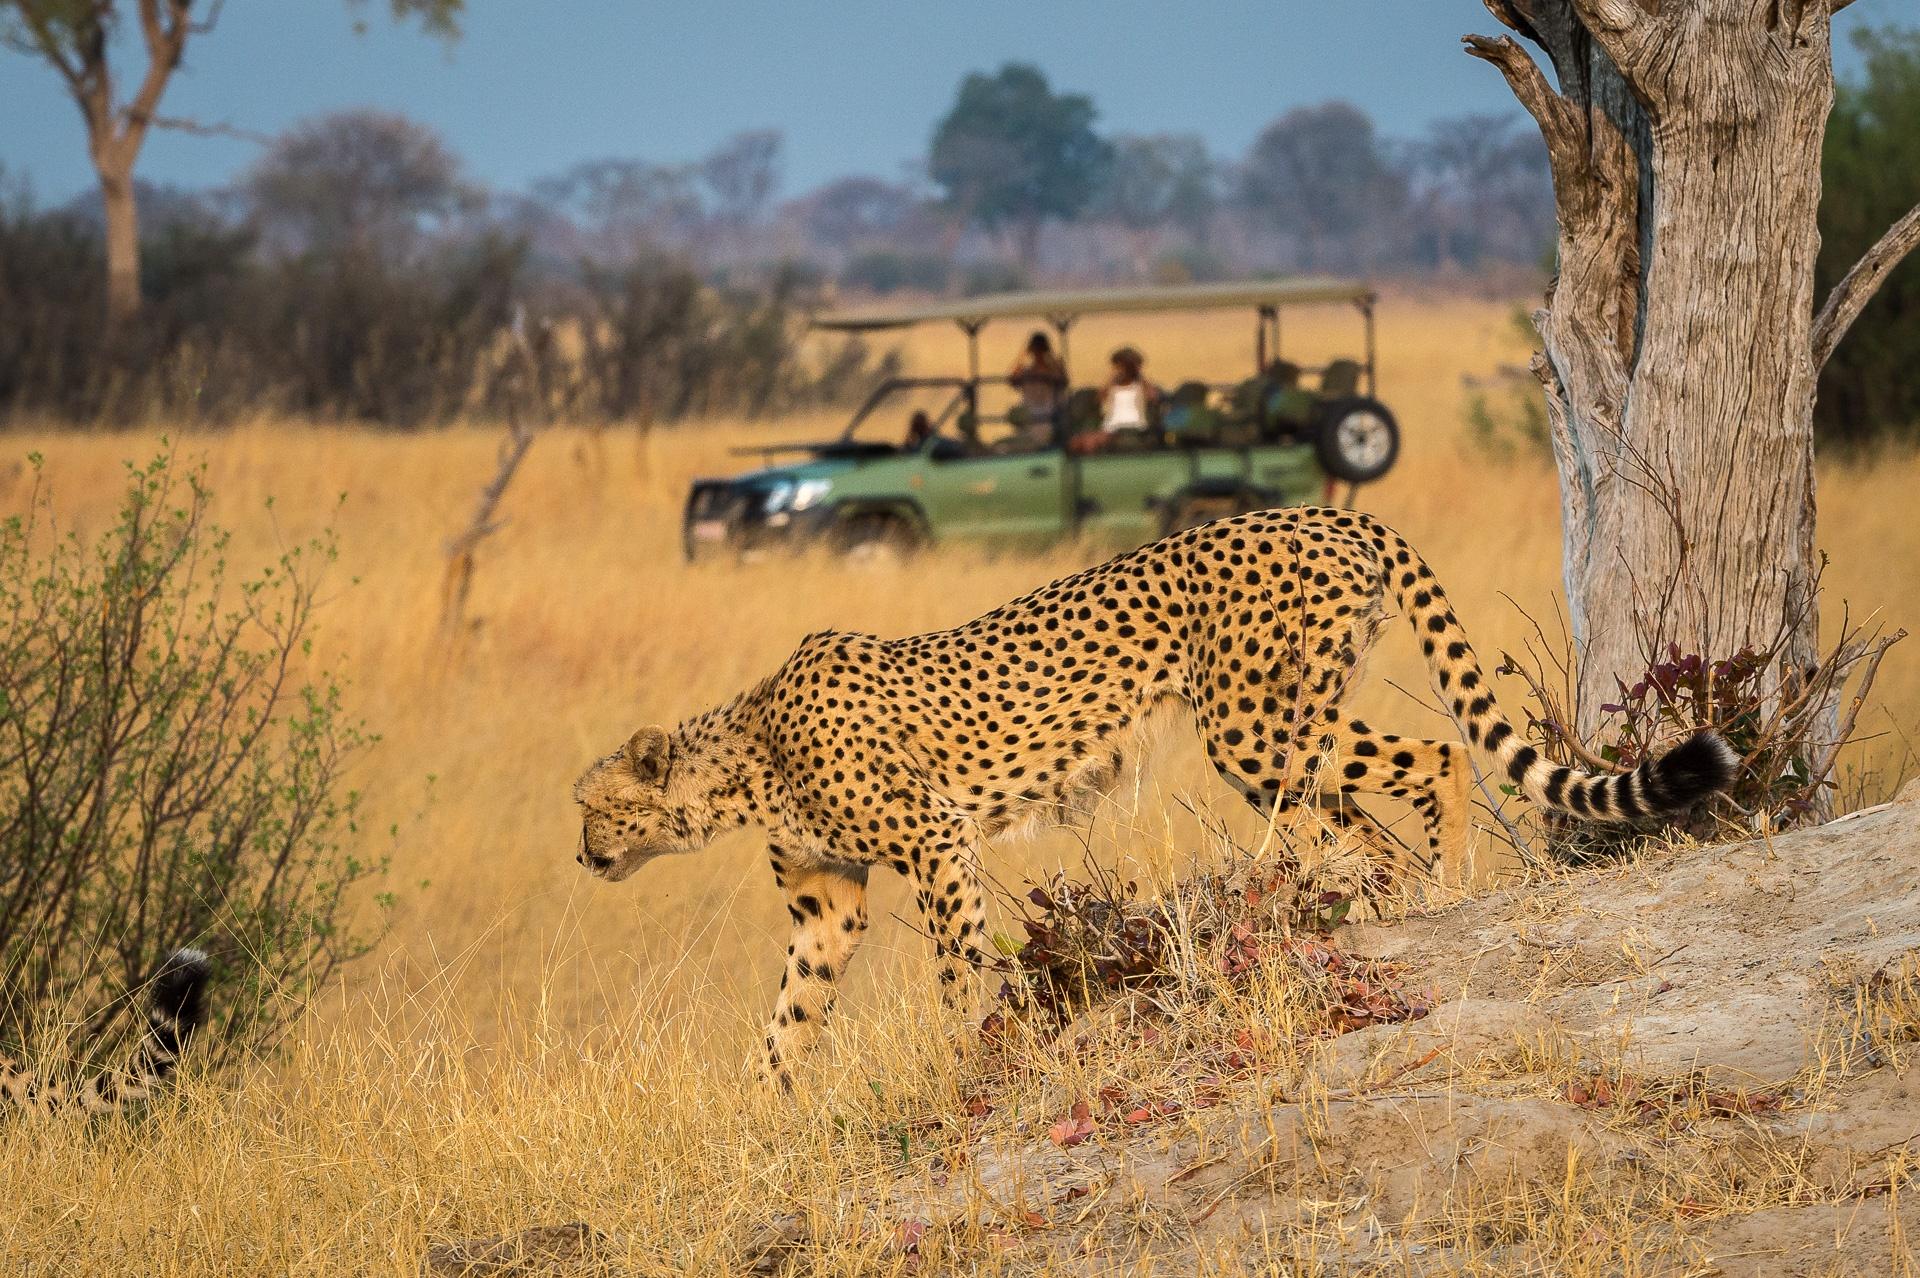 Cheetah in Africa, Travel Africa, Africa Safari Guide, Luxury African Safari